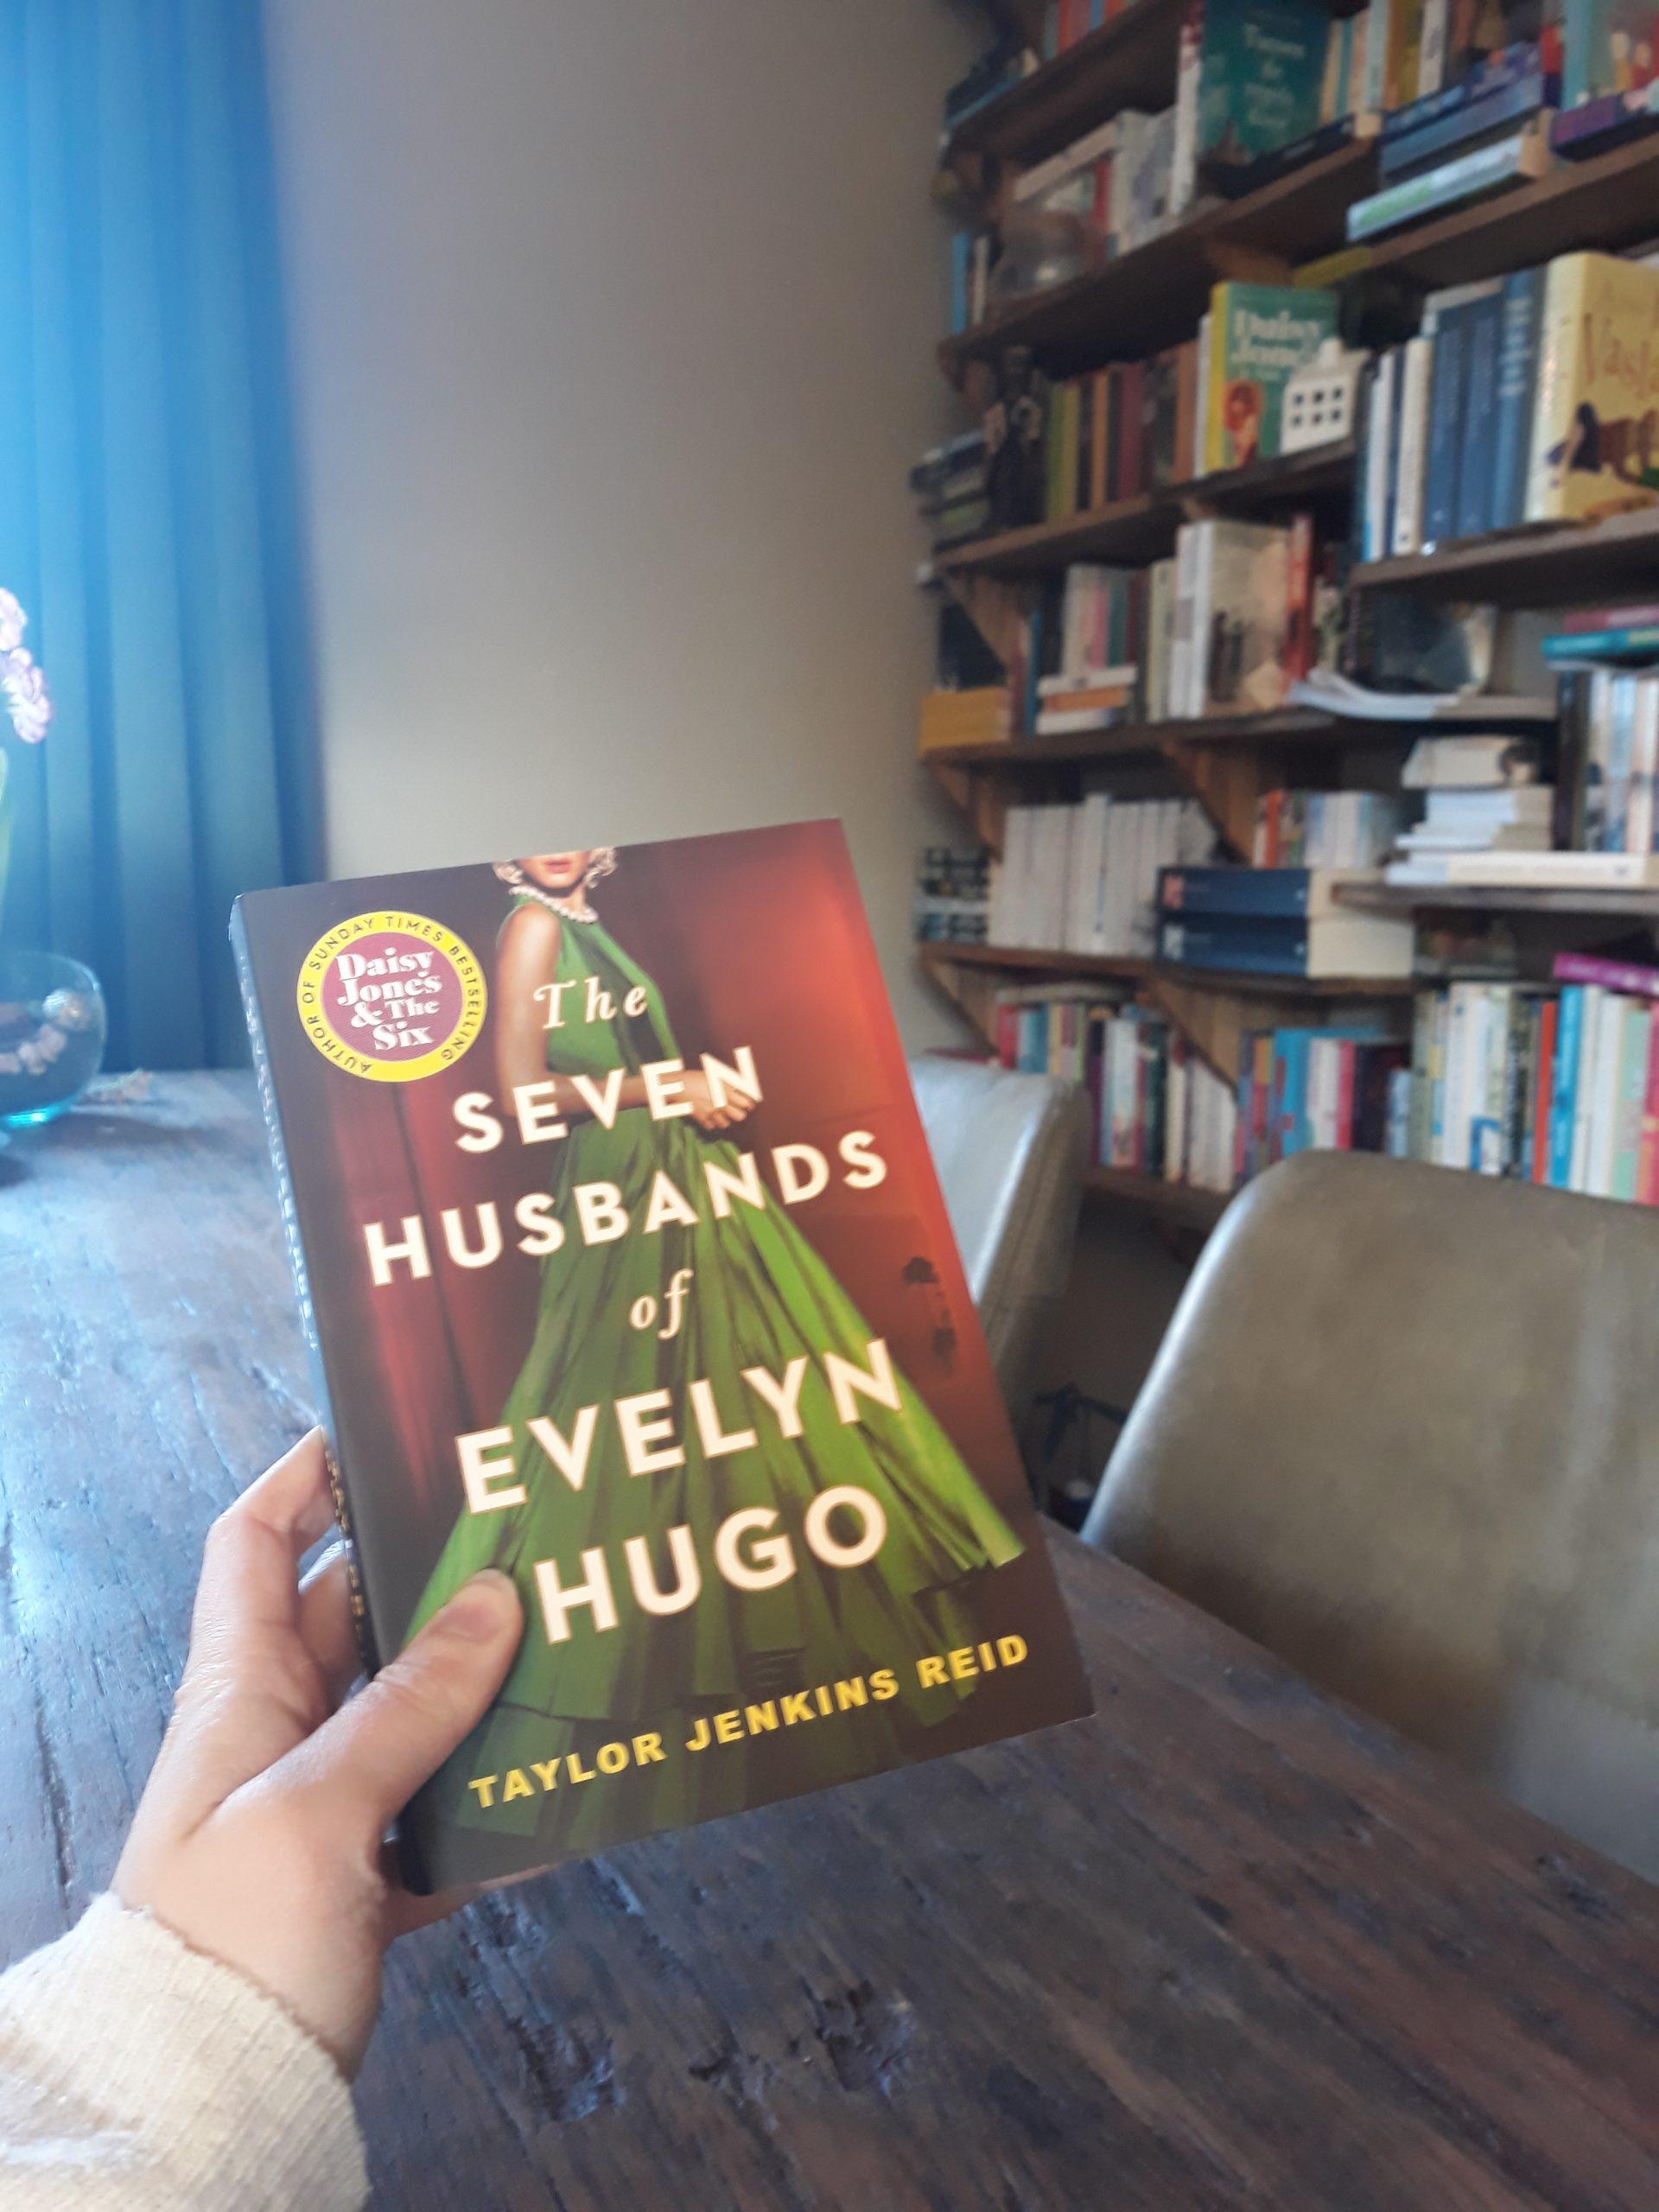 Boekrecensie: The Seven Husbands of Evelyn Hugo – Taylor Jenkins Reid